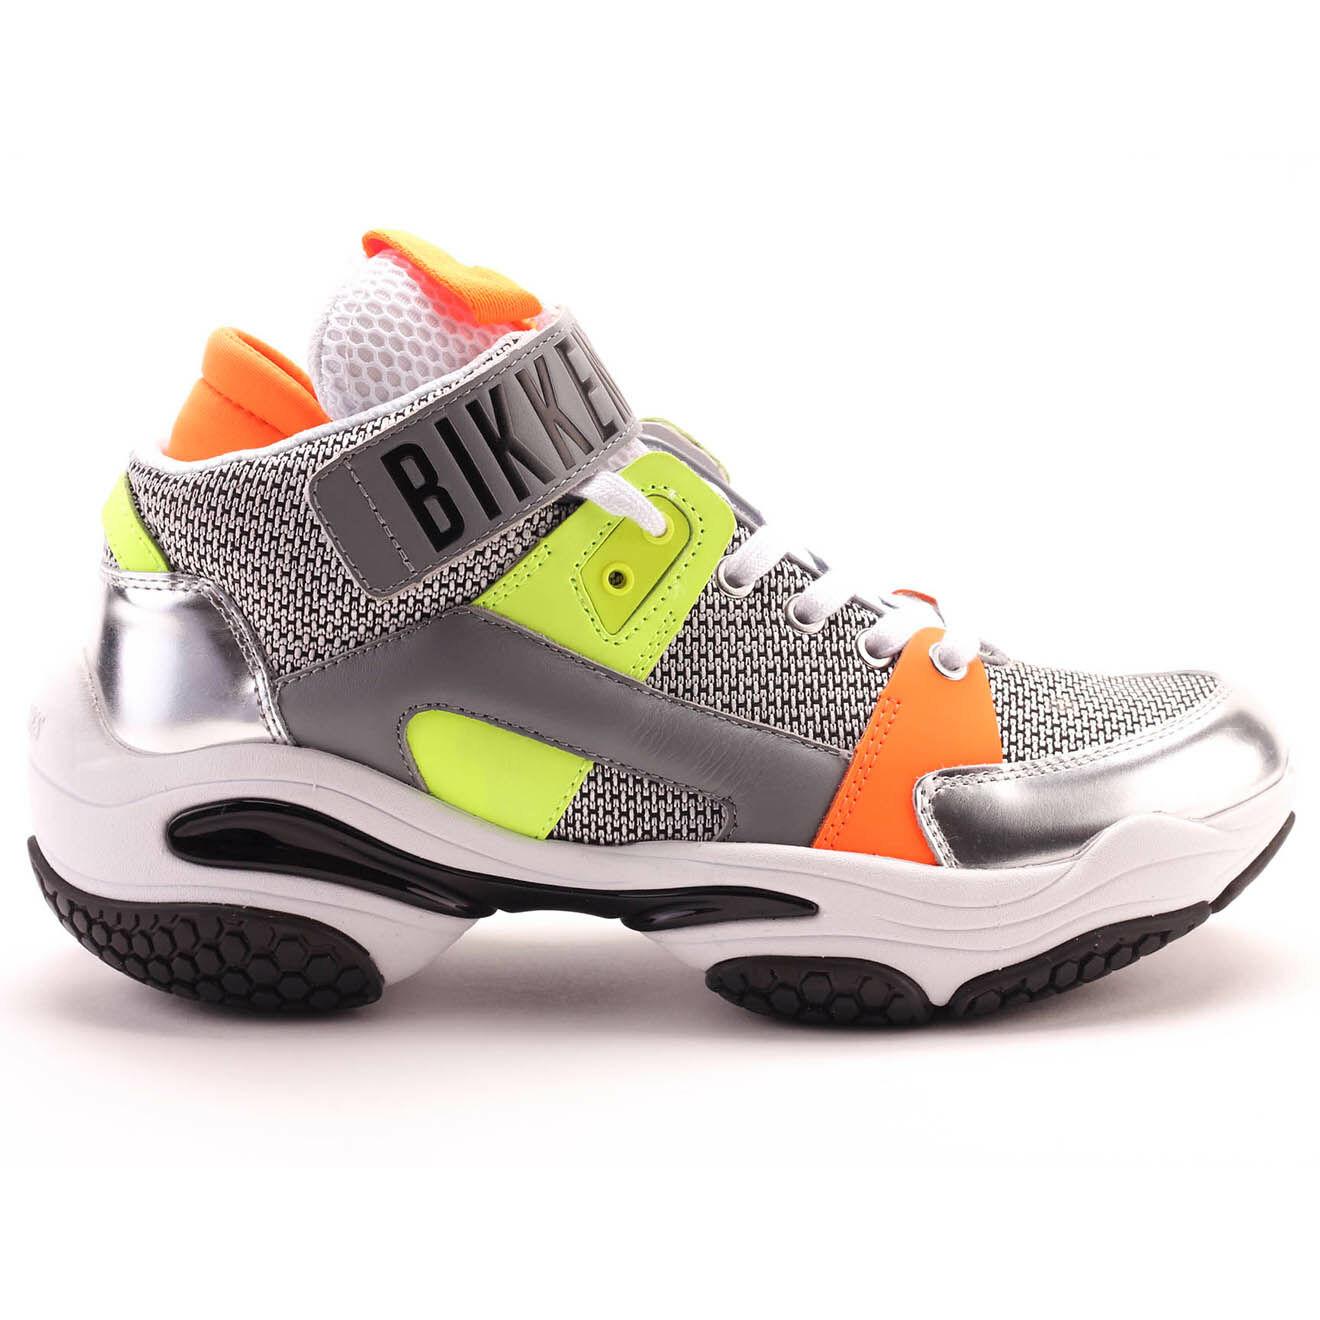 Sneakers montantes Platon en Cuir multicolore/argenté/orange - Bikkembergs - Modalova